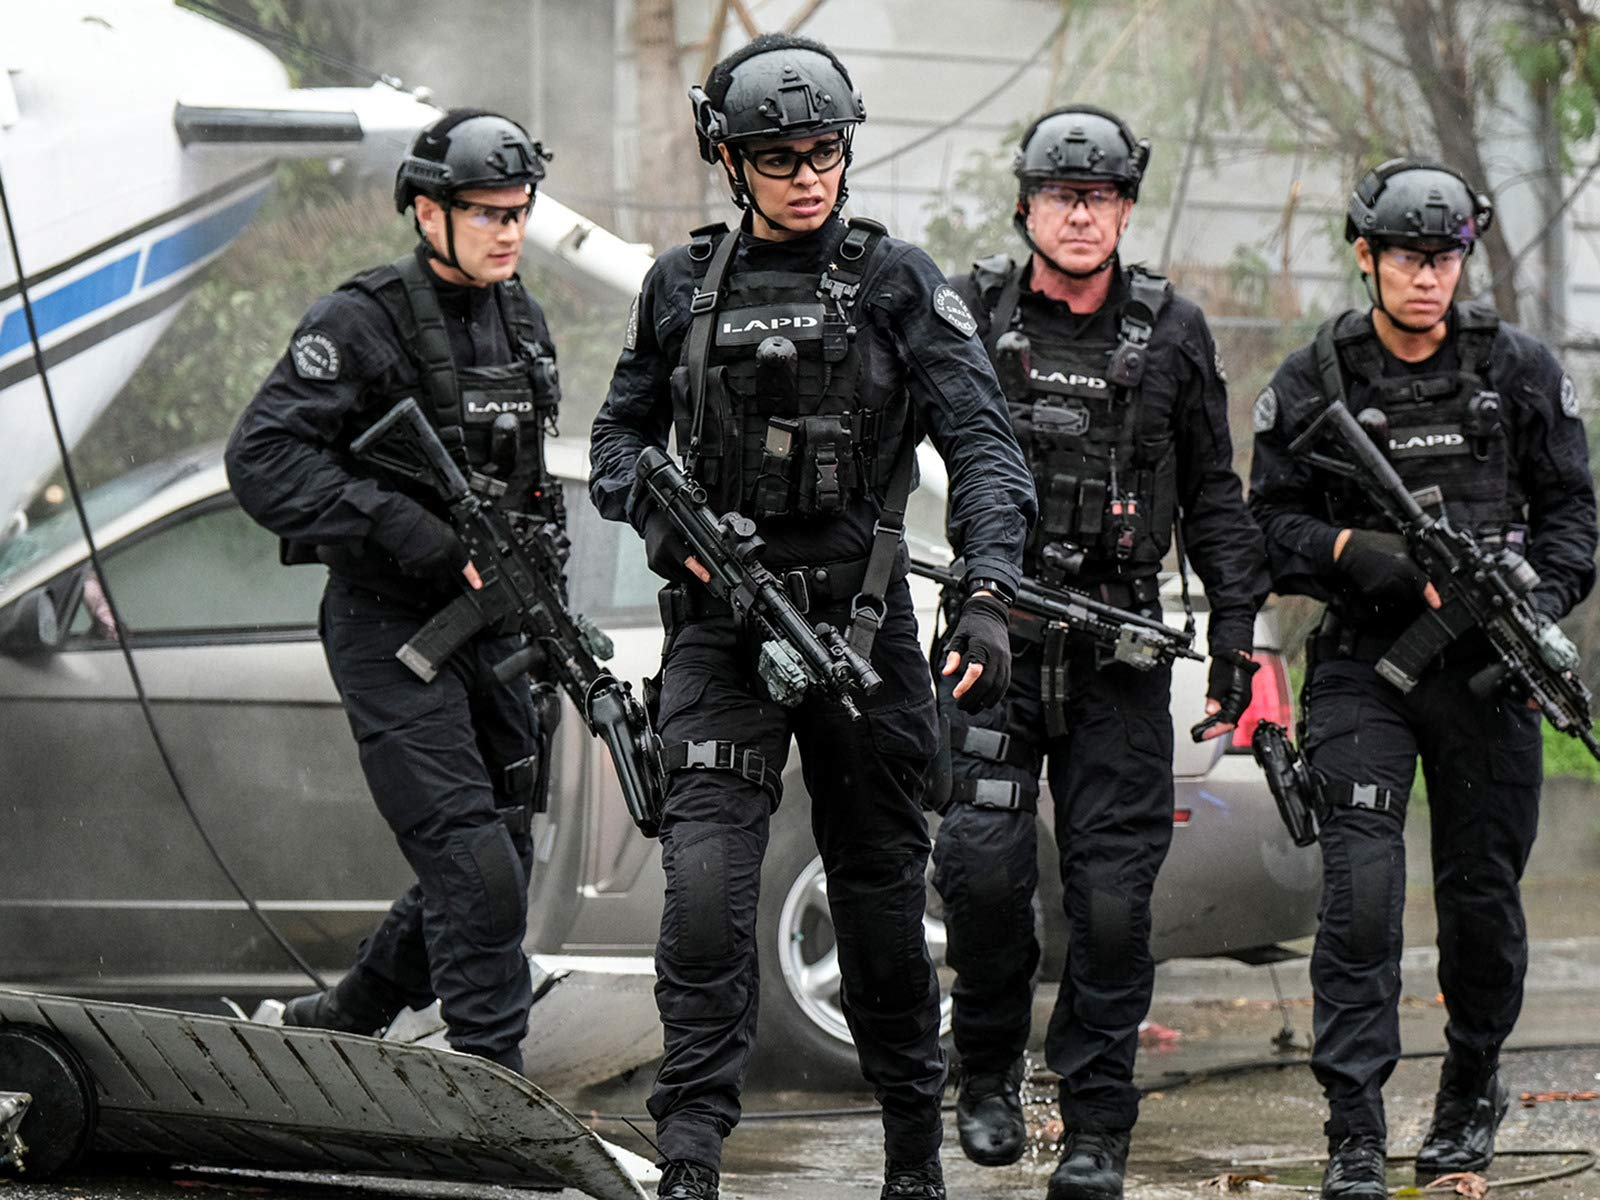 swat team dating site)